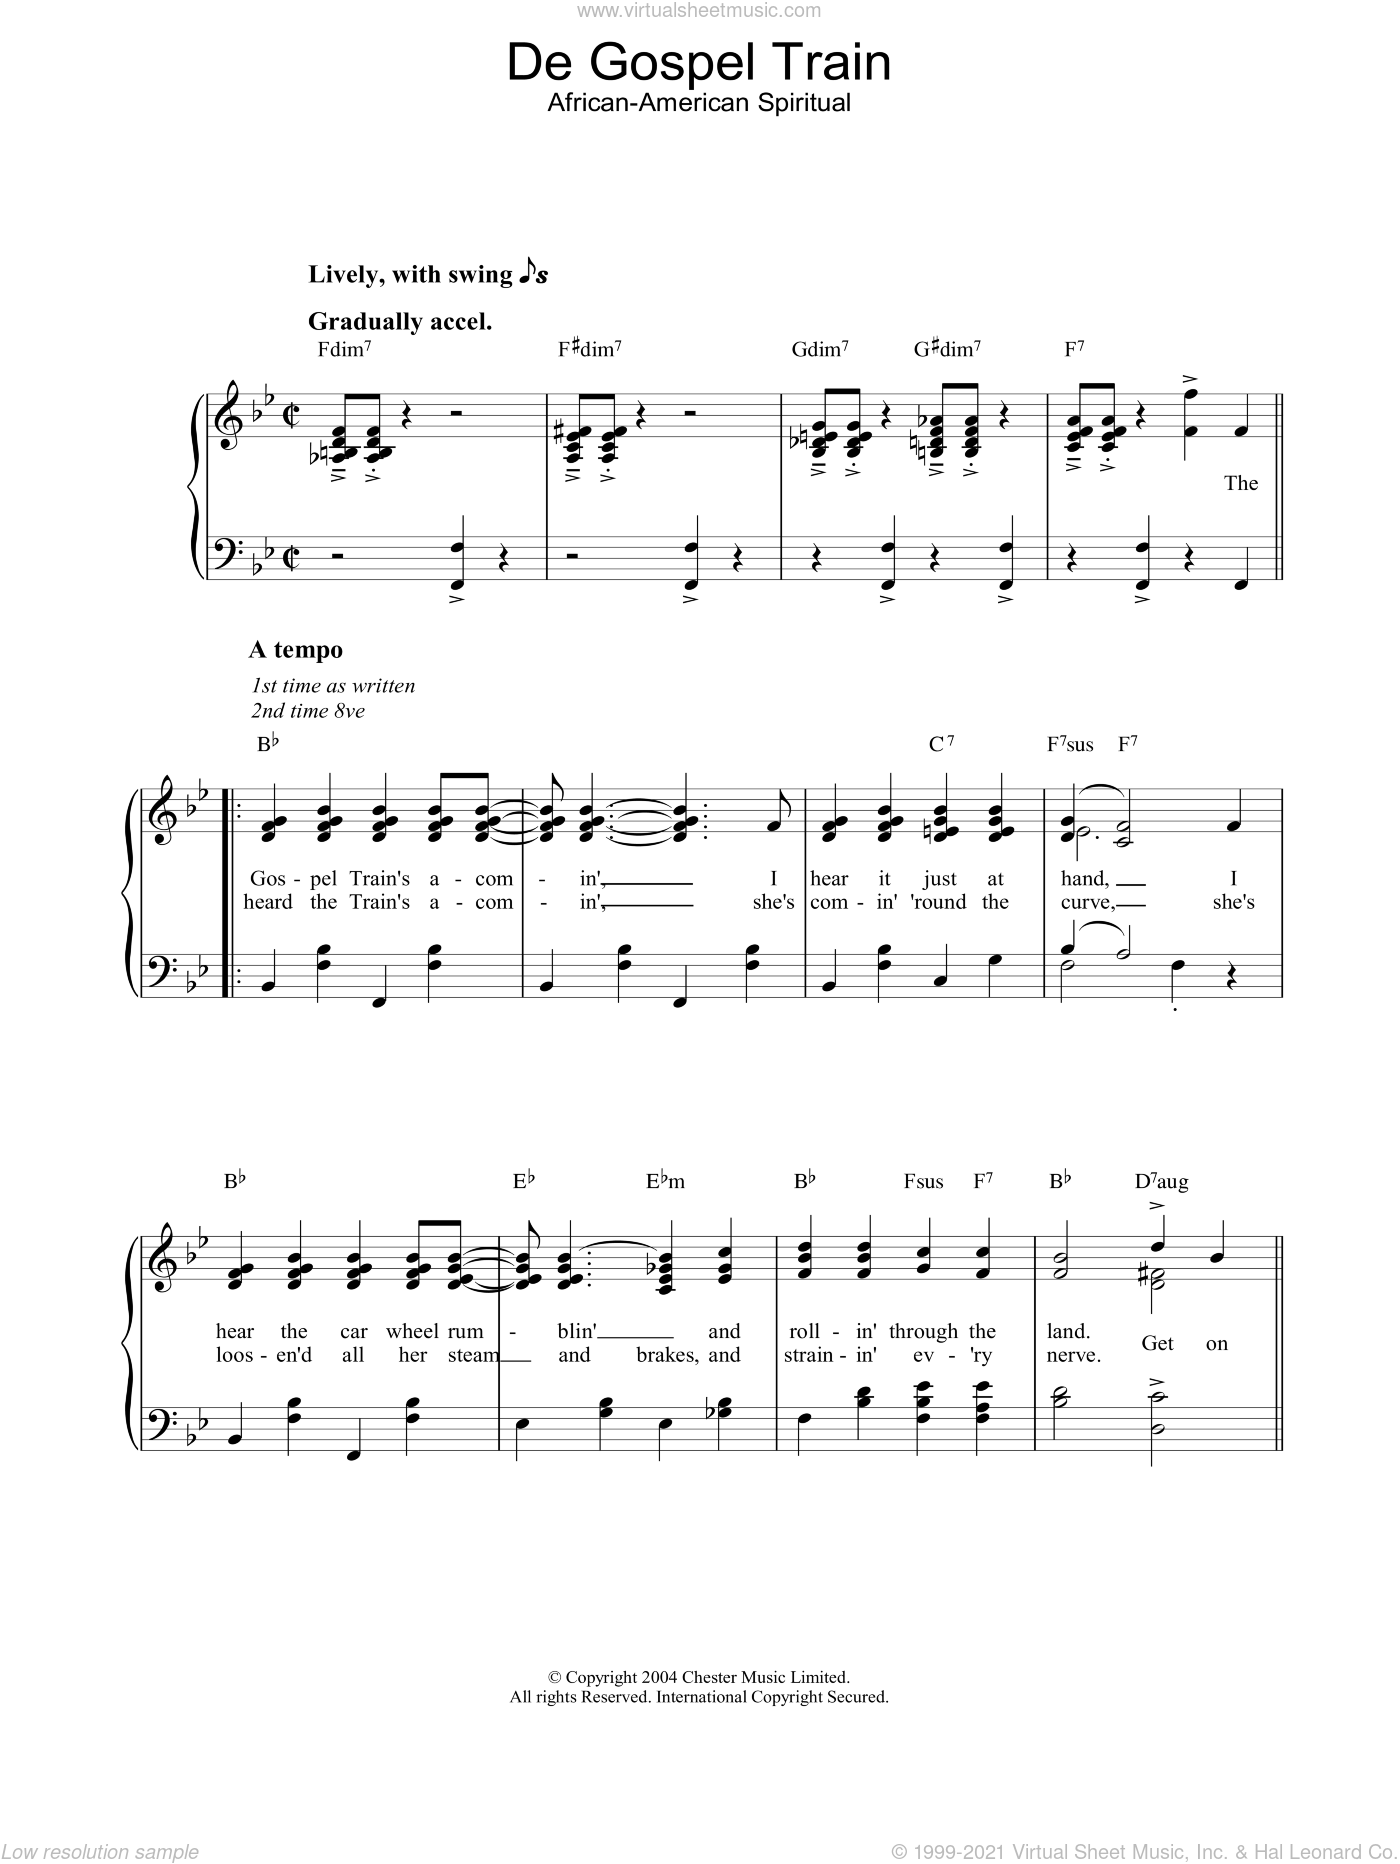 De Gospel Train sheet music for piano solo [PDF]